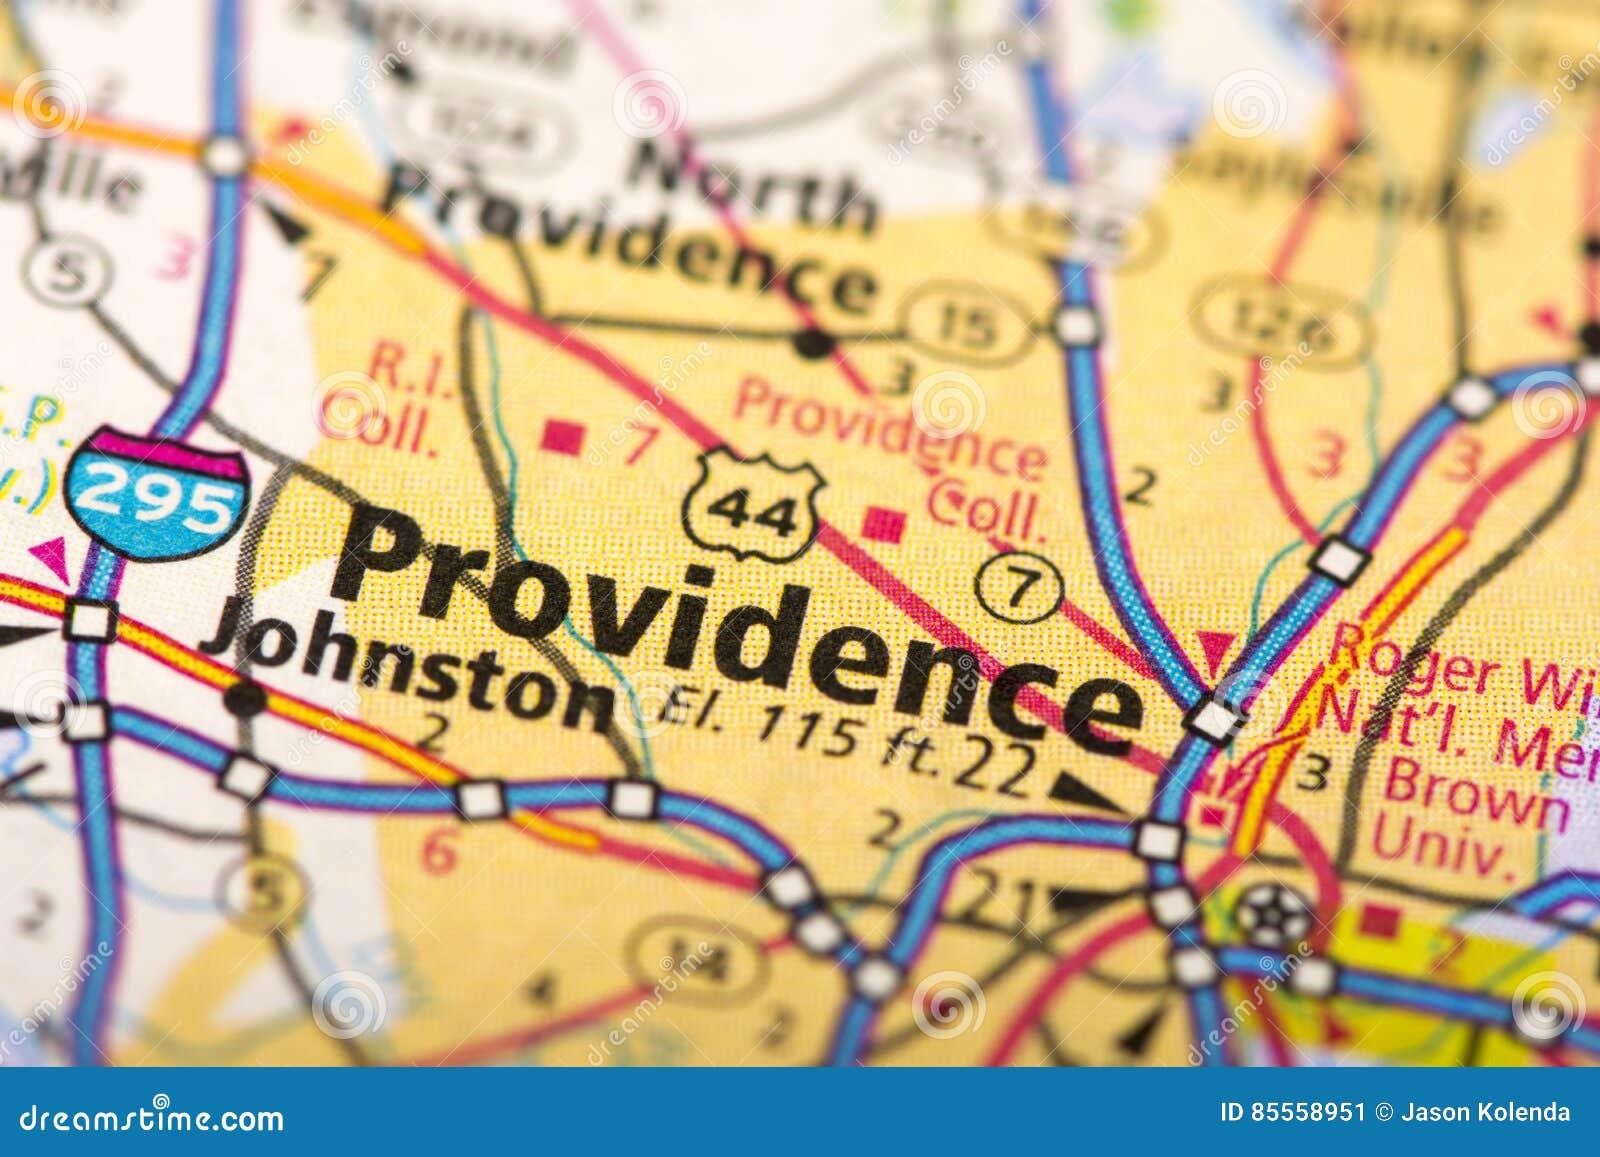 Providence, Rhode Island auf Karte